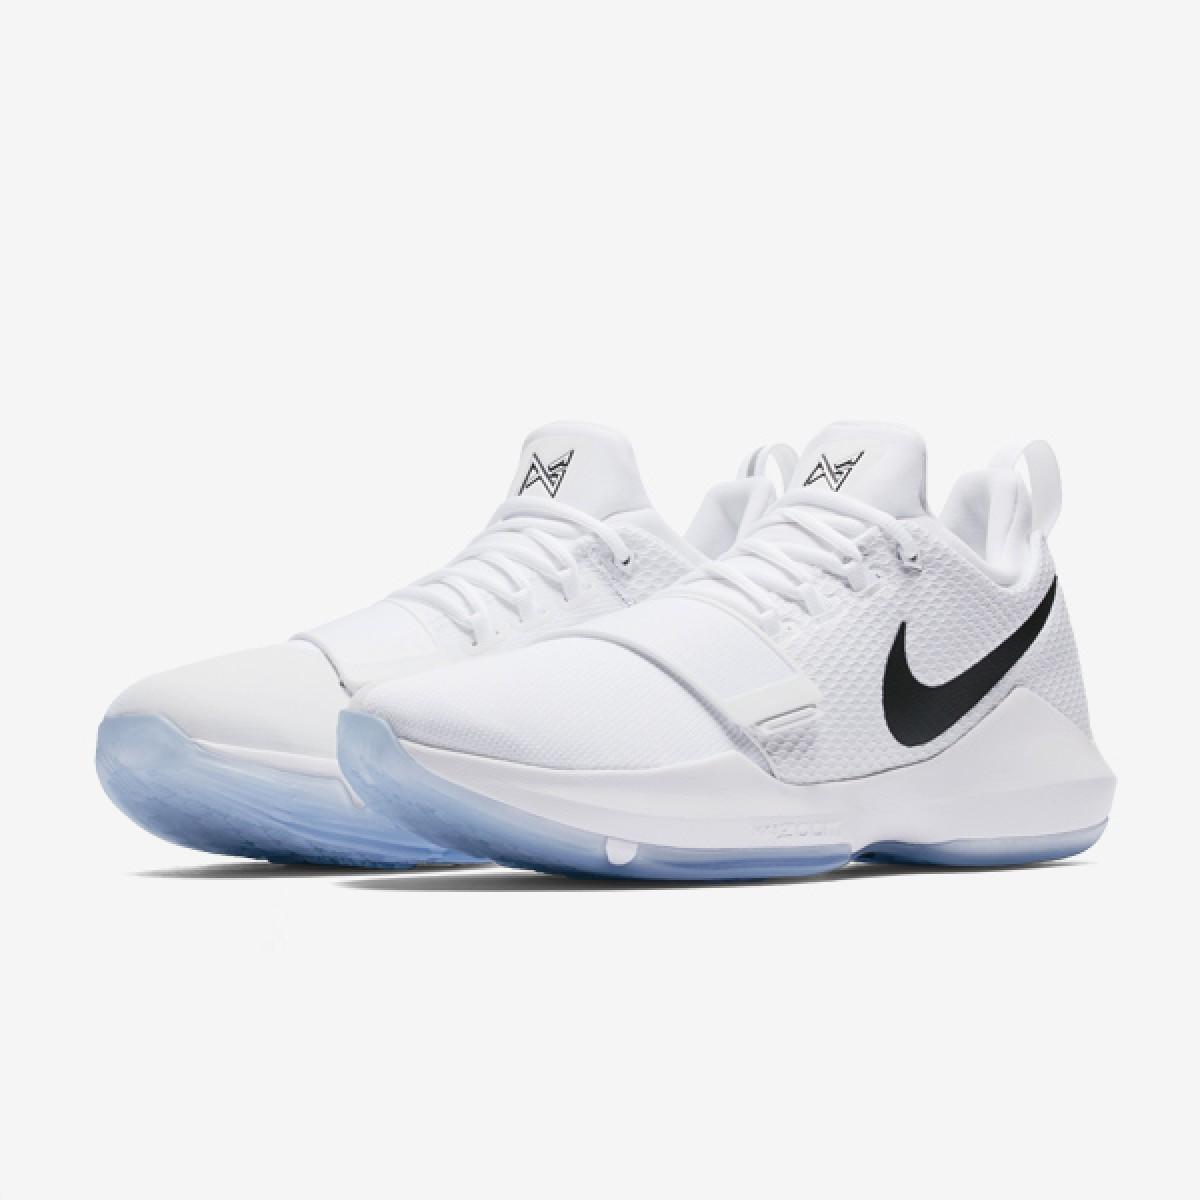 Nike PG 1 'White Ice' 878627-100